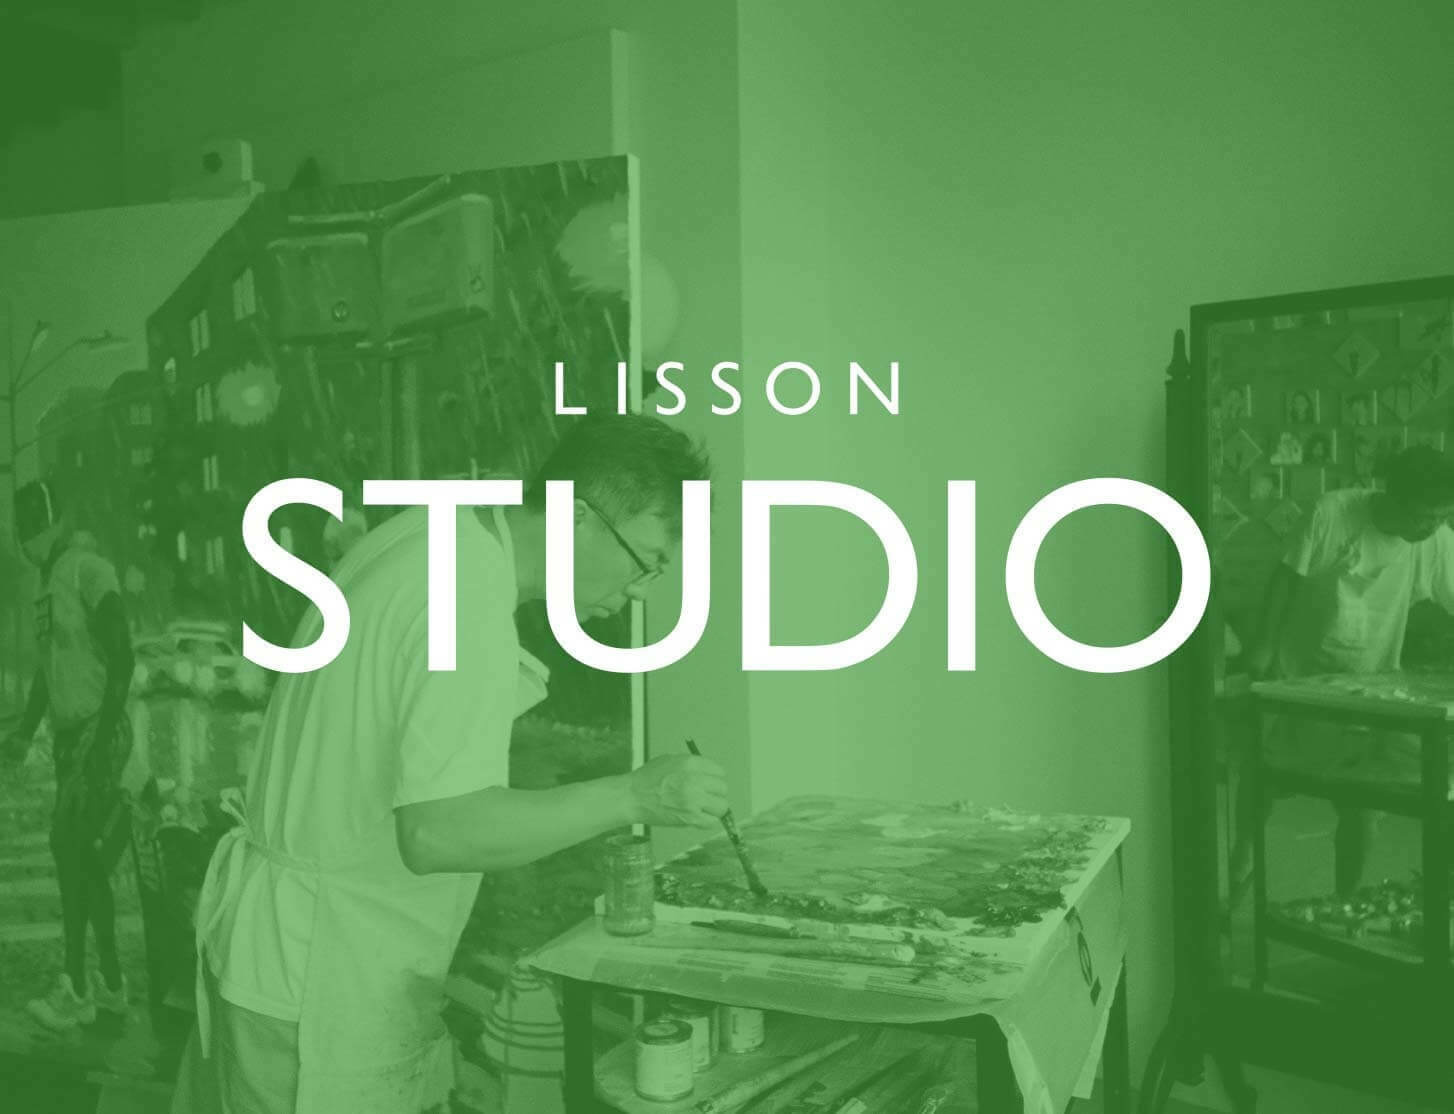 Lisson Studio: Liu Xiaodong paints June 2020, New York